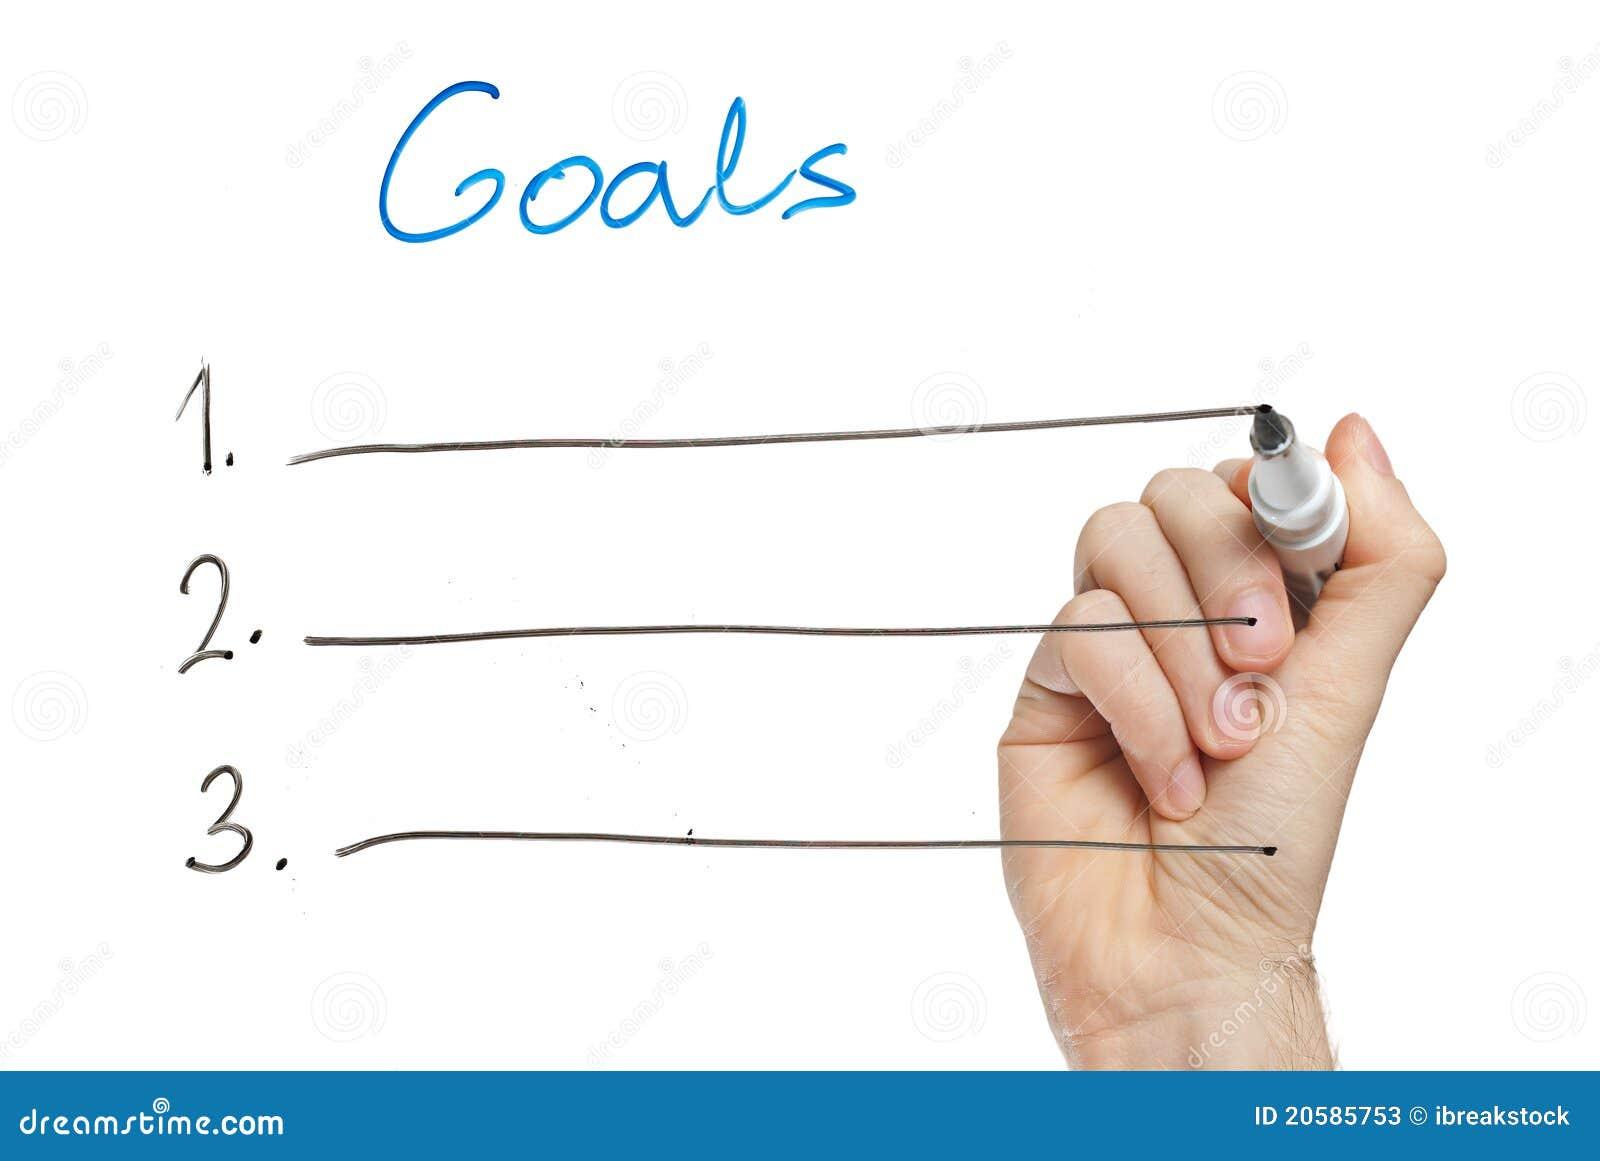 Goal setting essay